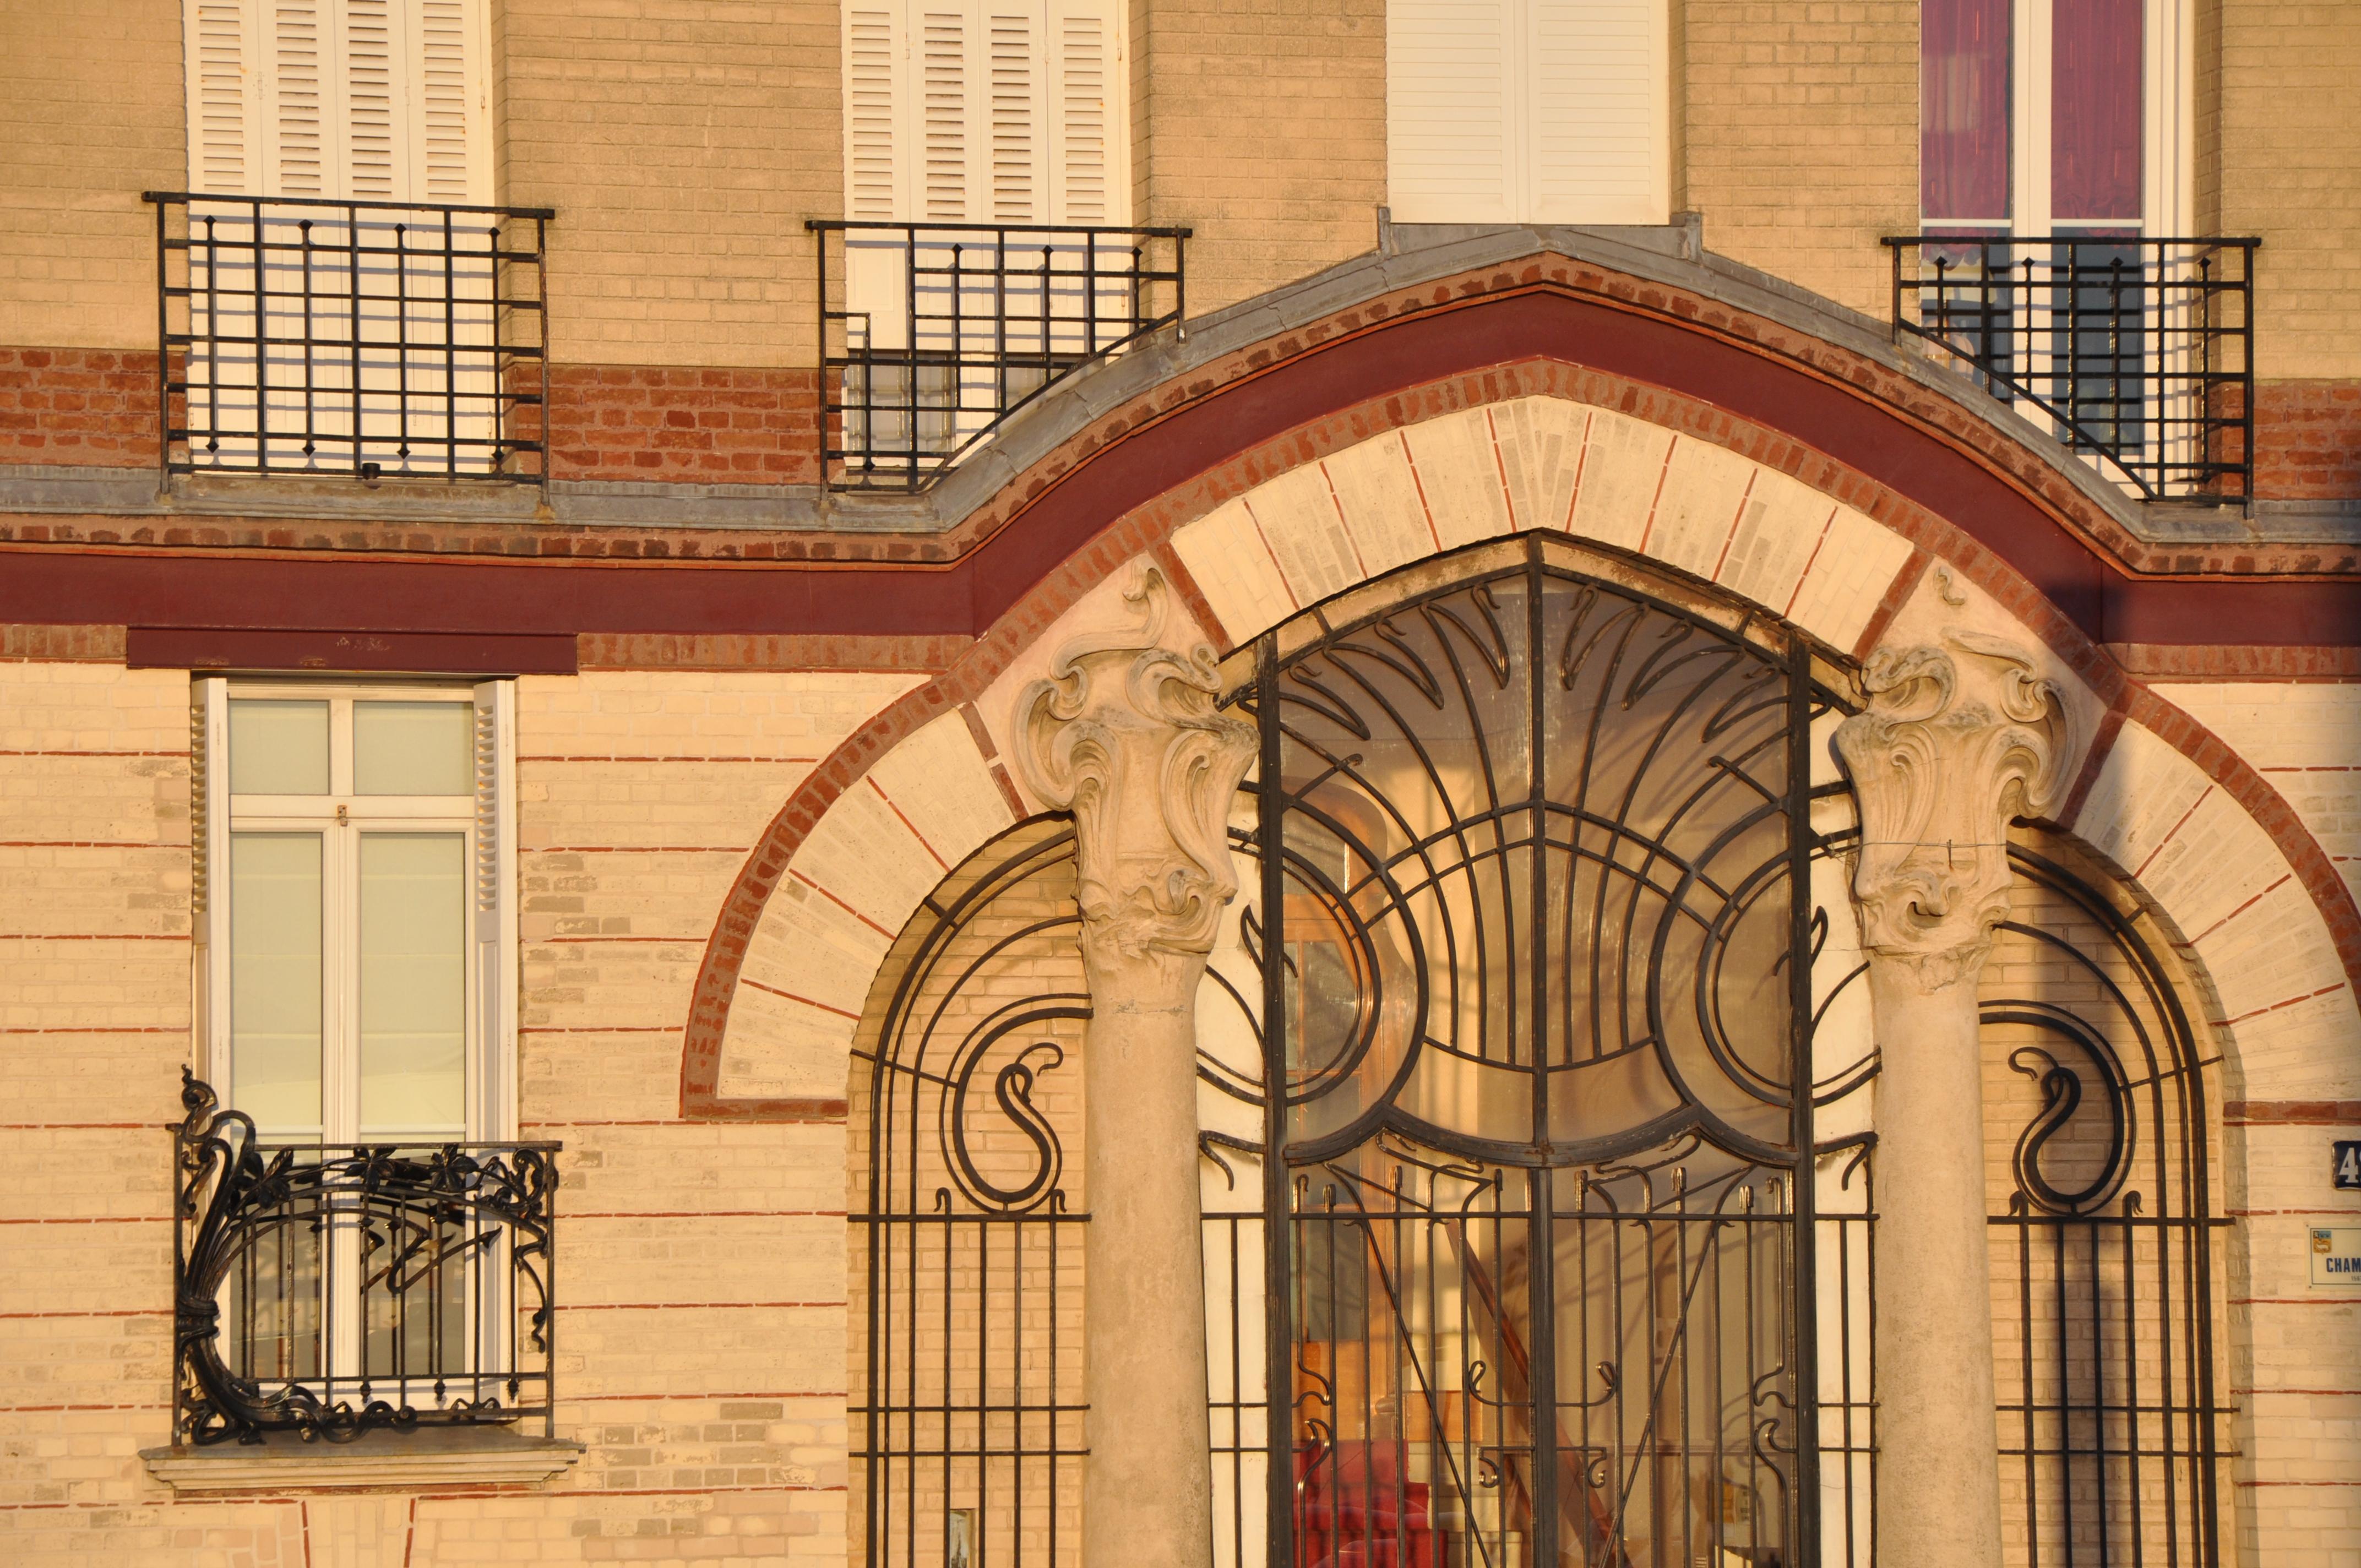 File:Le Havre (France), art nouveau facade.JPG - Wikimedia Commons